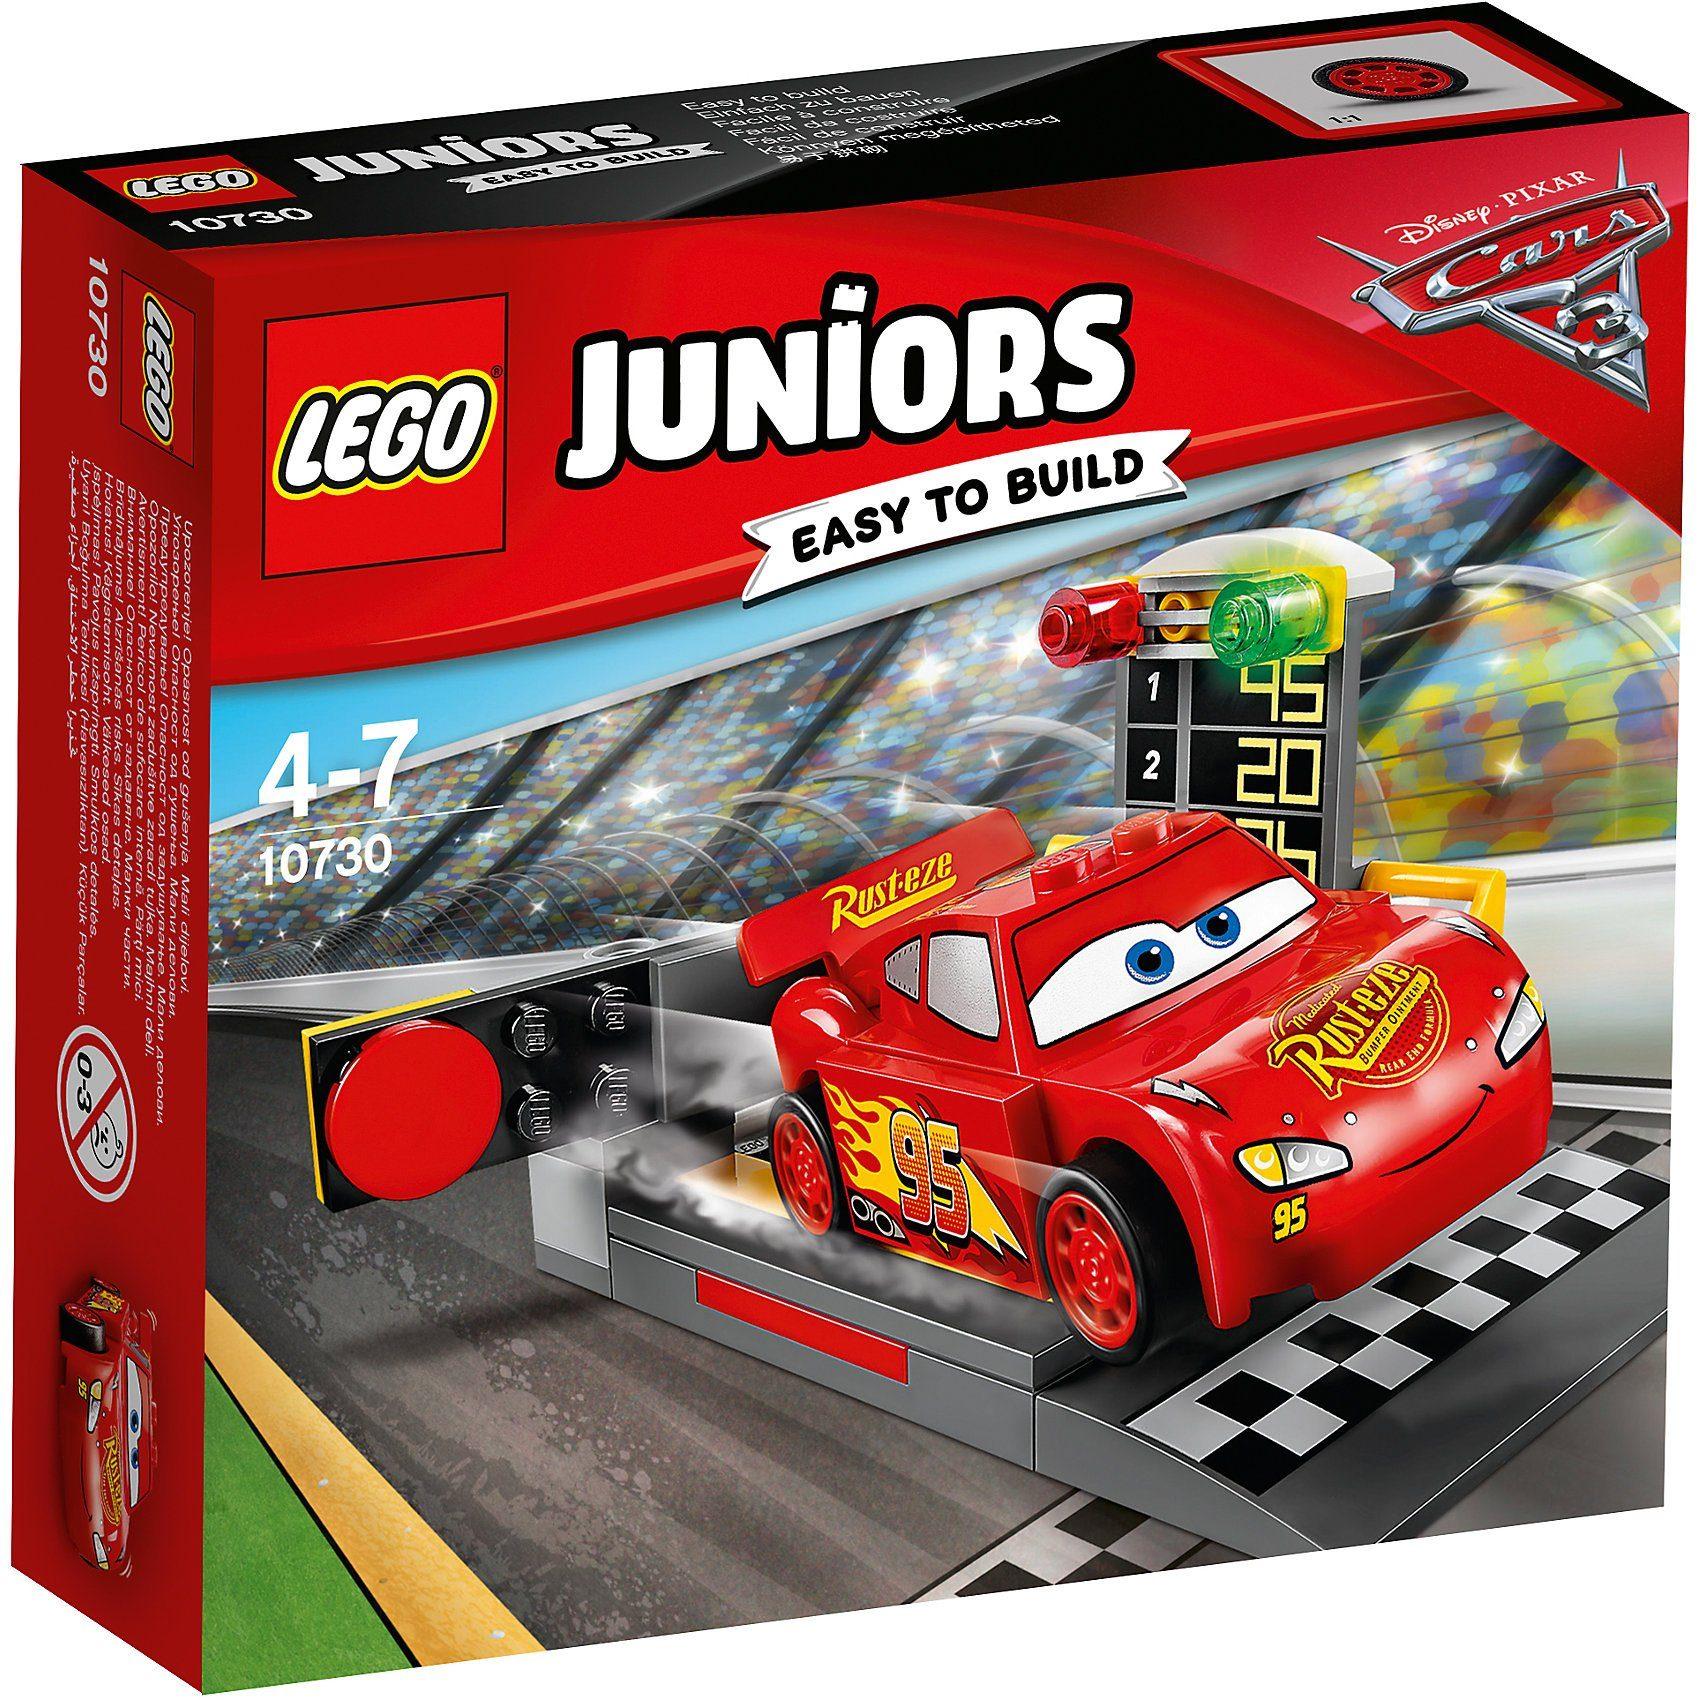 LEGO 10730 Juniors: CARS Lightning McQueens Beschleunigungsrampe